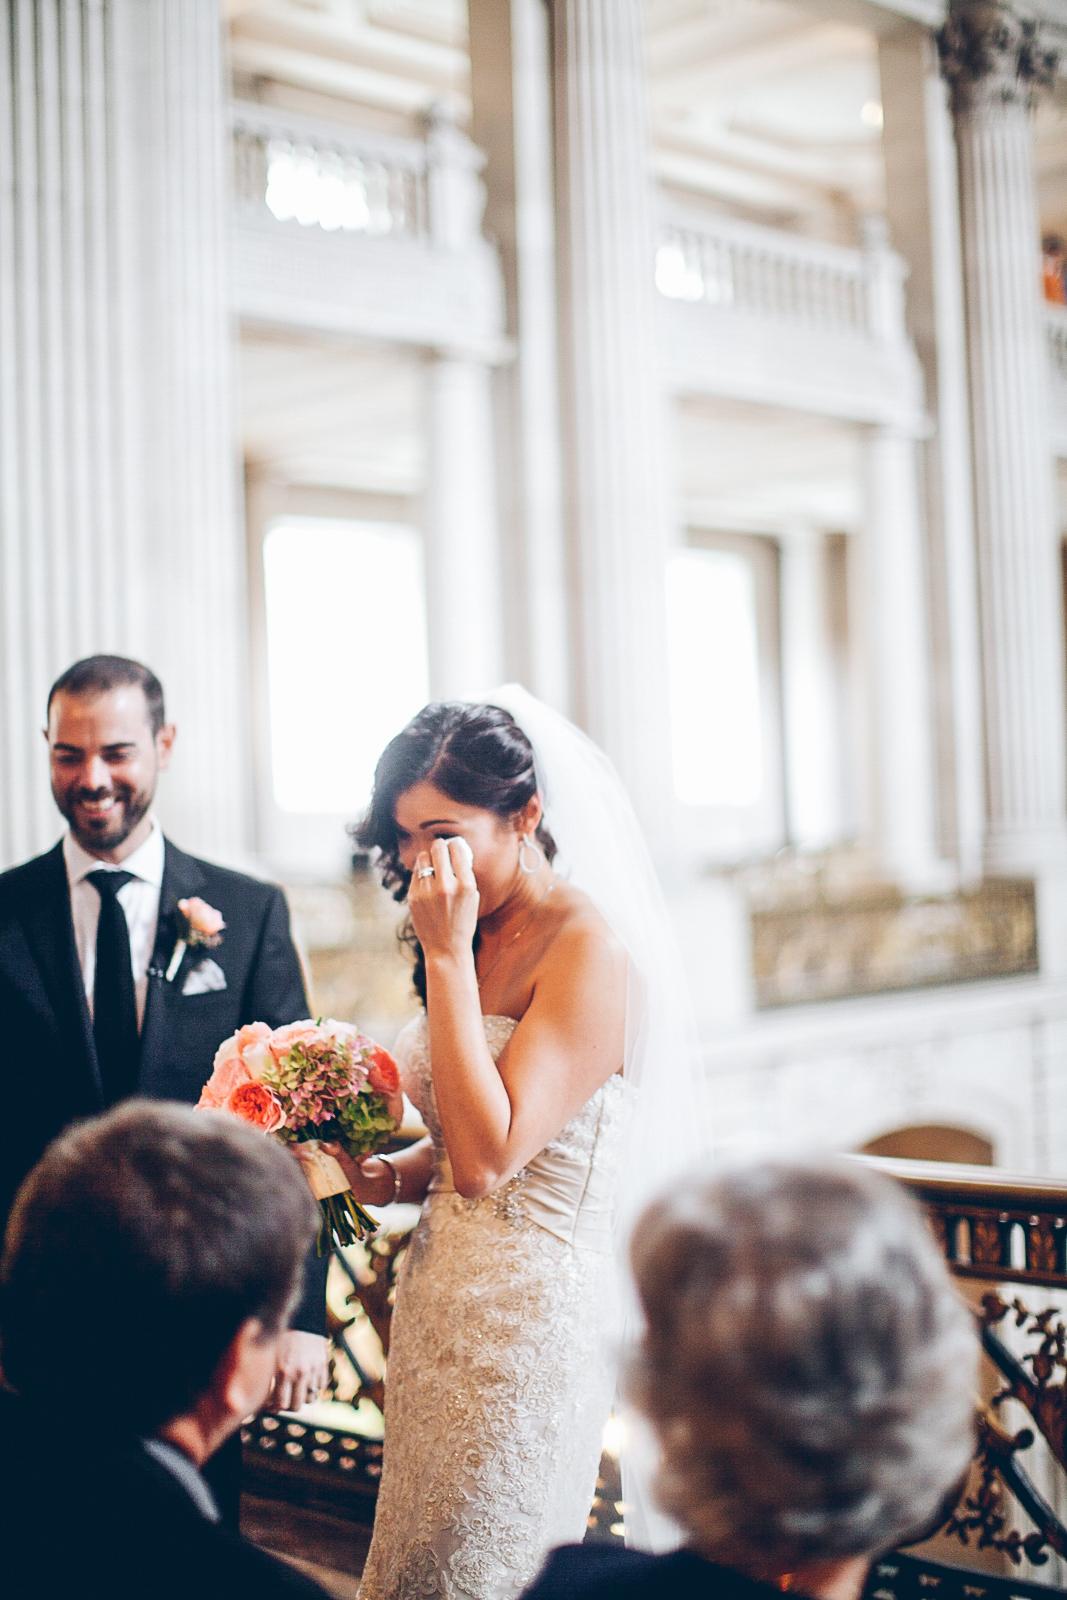 San_francisco_city_hall_wedding_photography_meegan_travis_ebony_siovhan_bokeh_photography_27.jpg